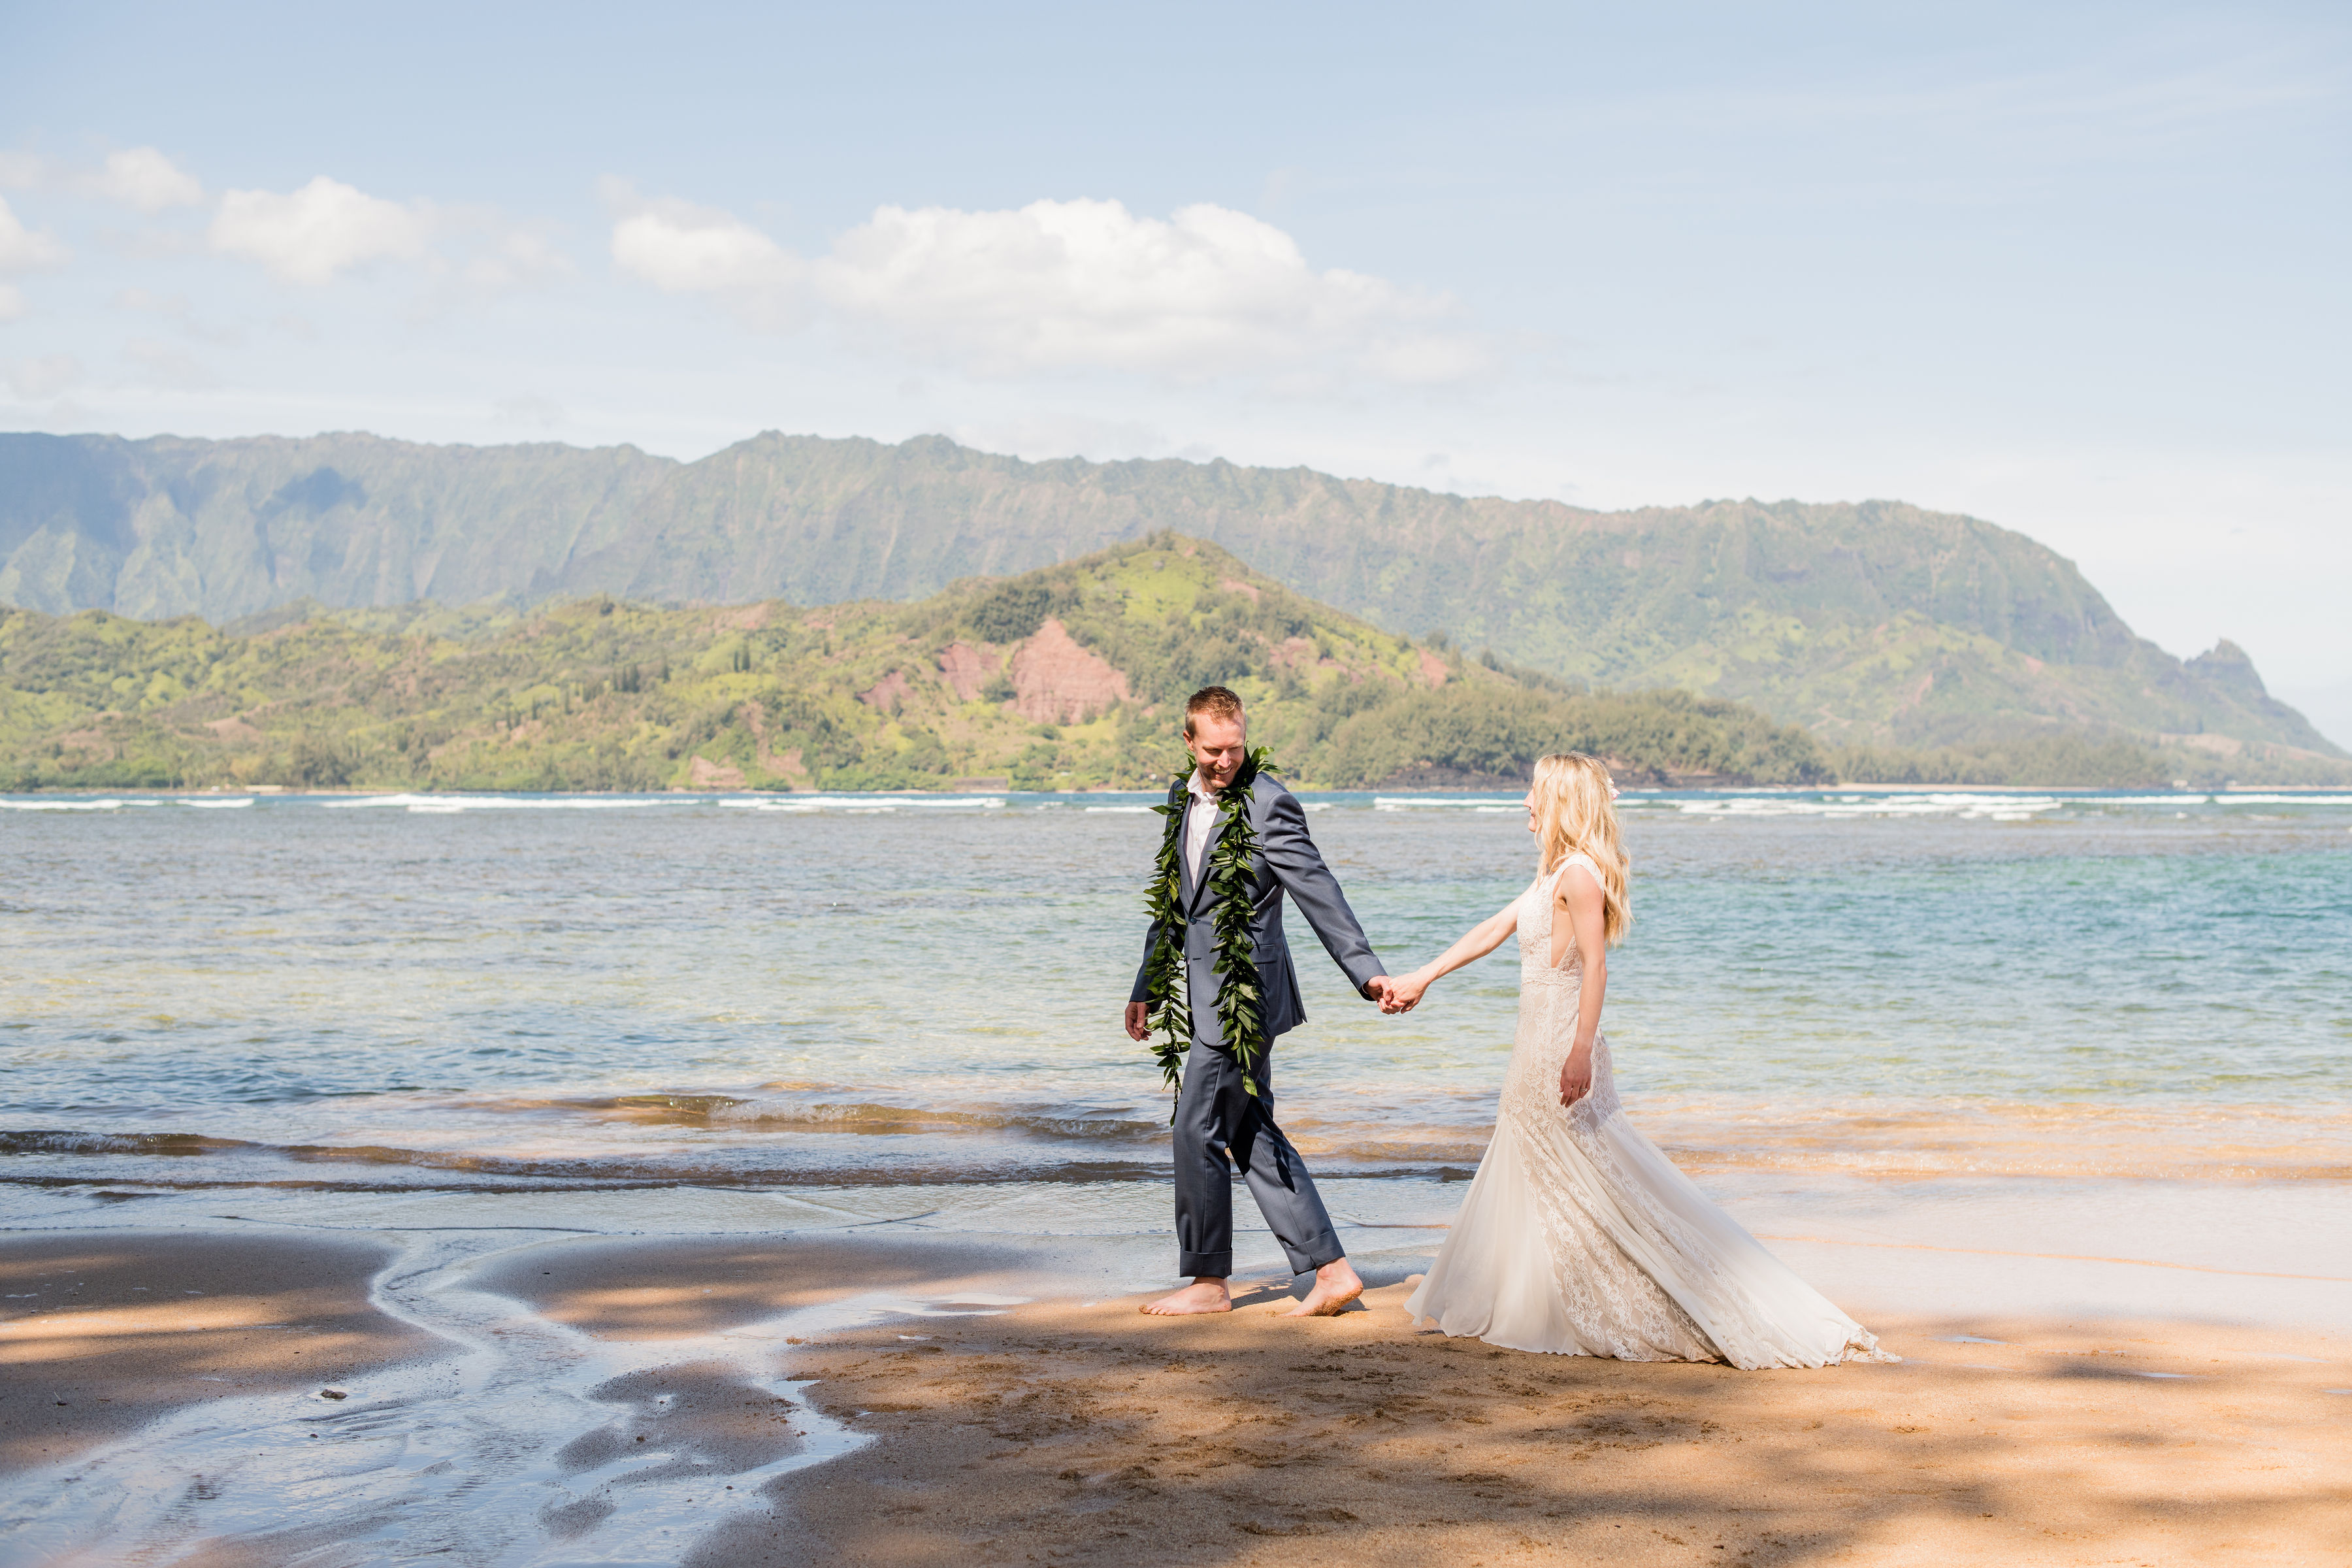 Morning ceremony at Puu Poa beach for Teri and Dallis' Kauai Elopement